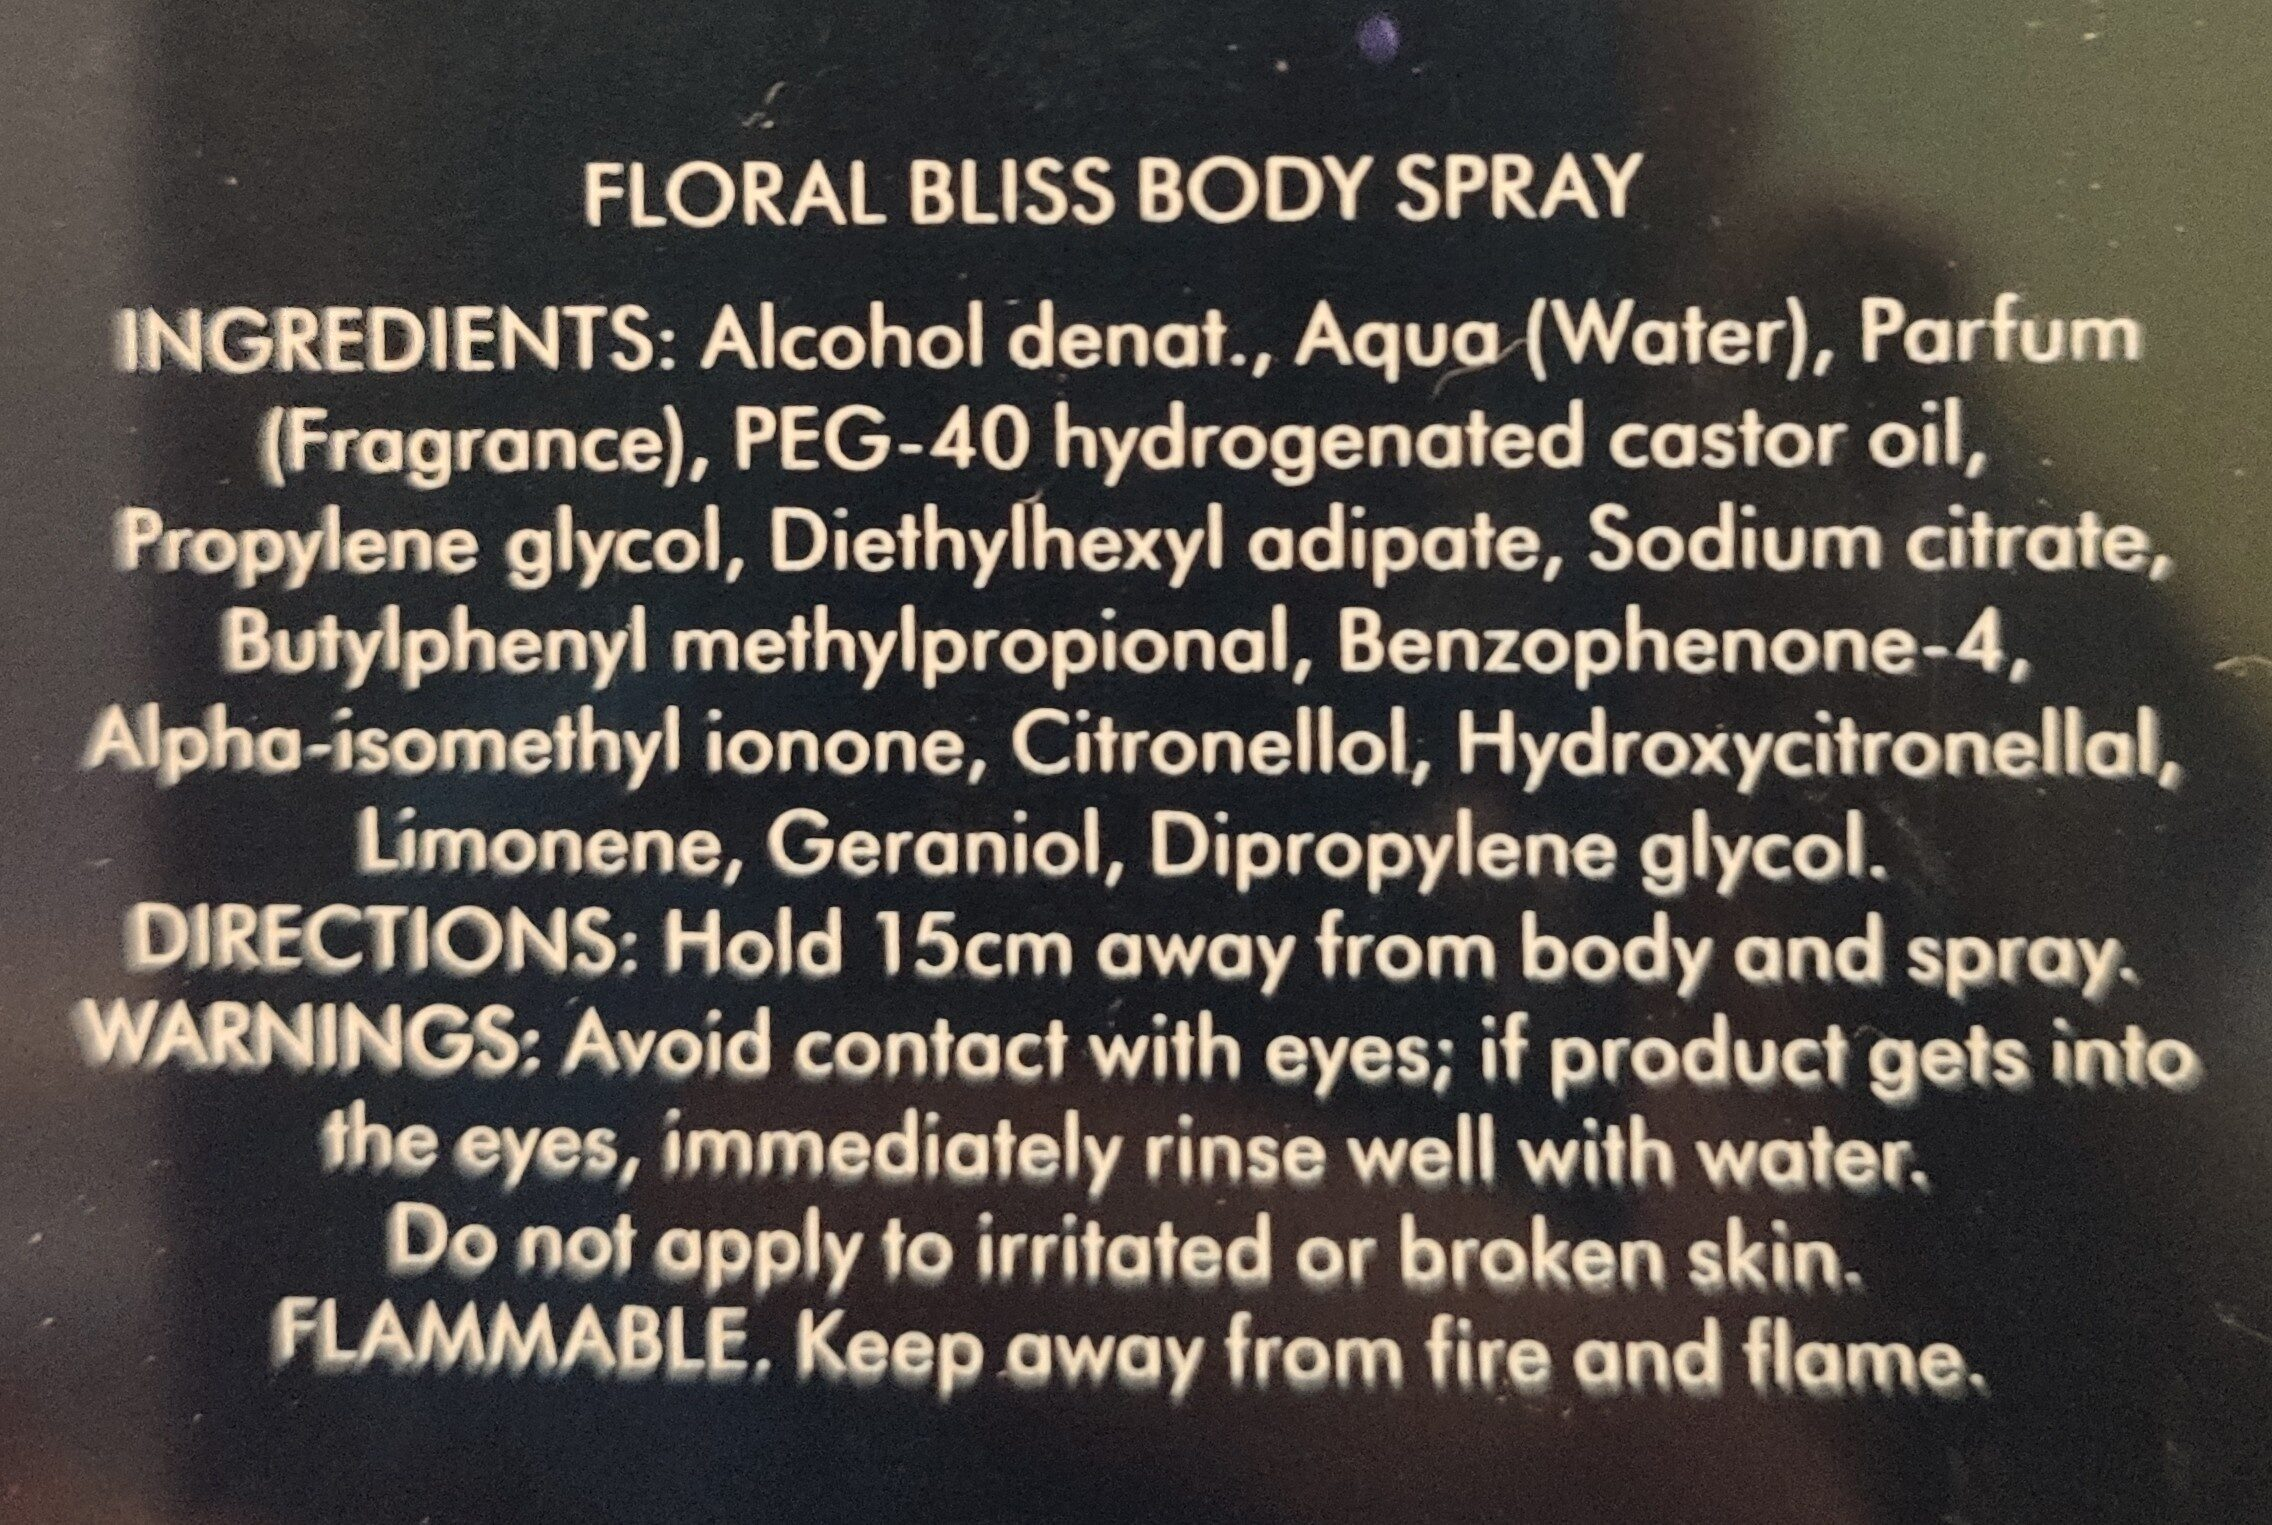 floral bliss body spray - Ingrédients - en